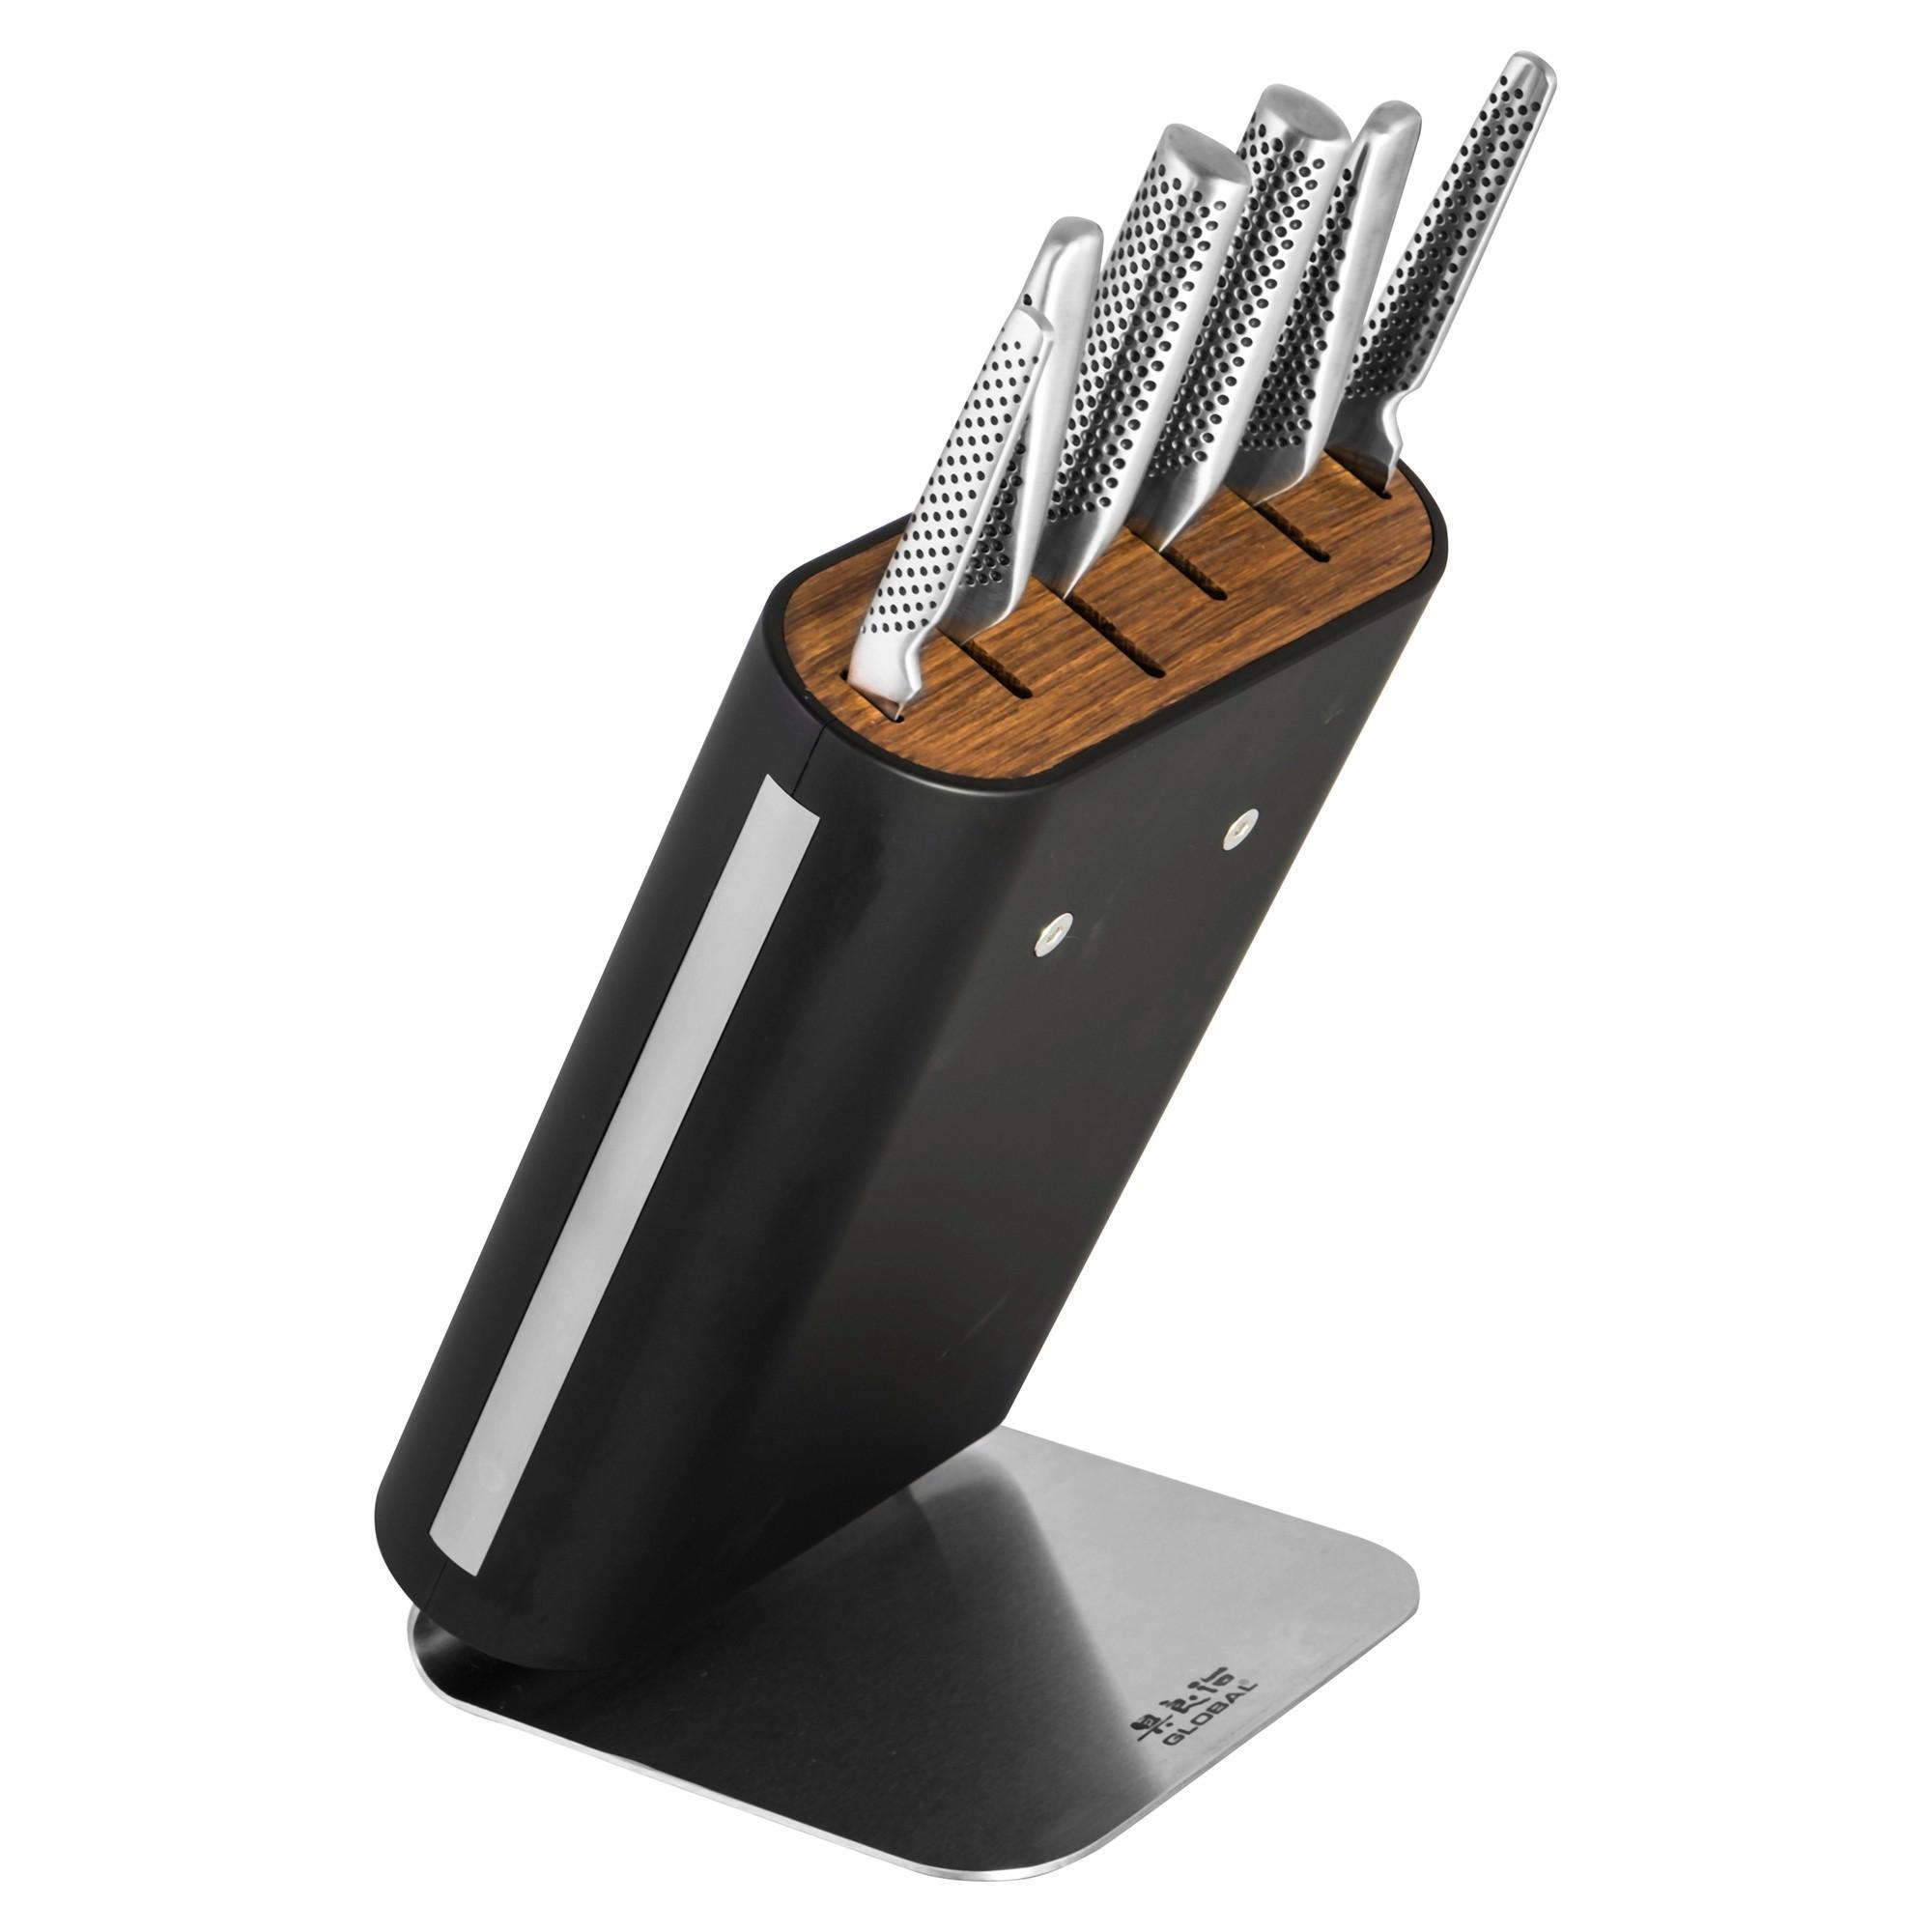 Global Hiro 7 Piece Knife Block Set  - Black